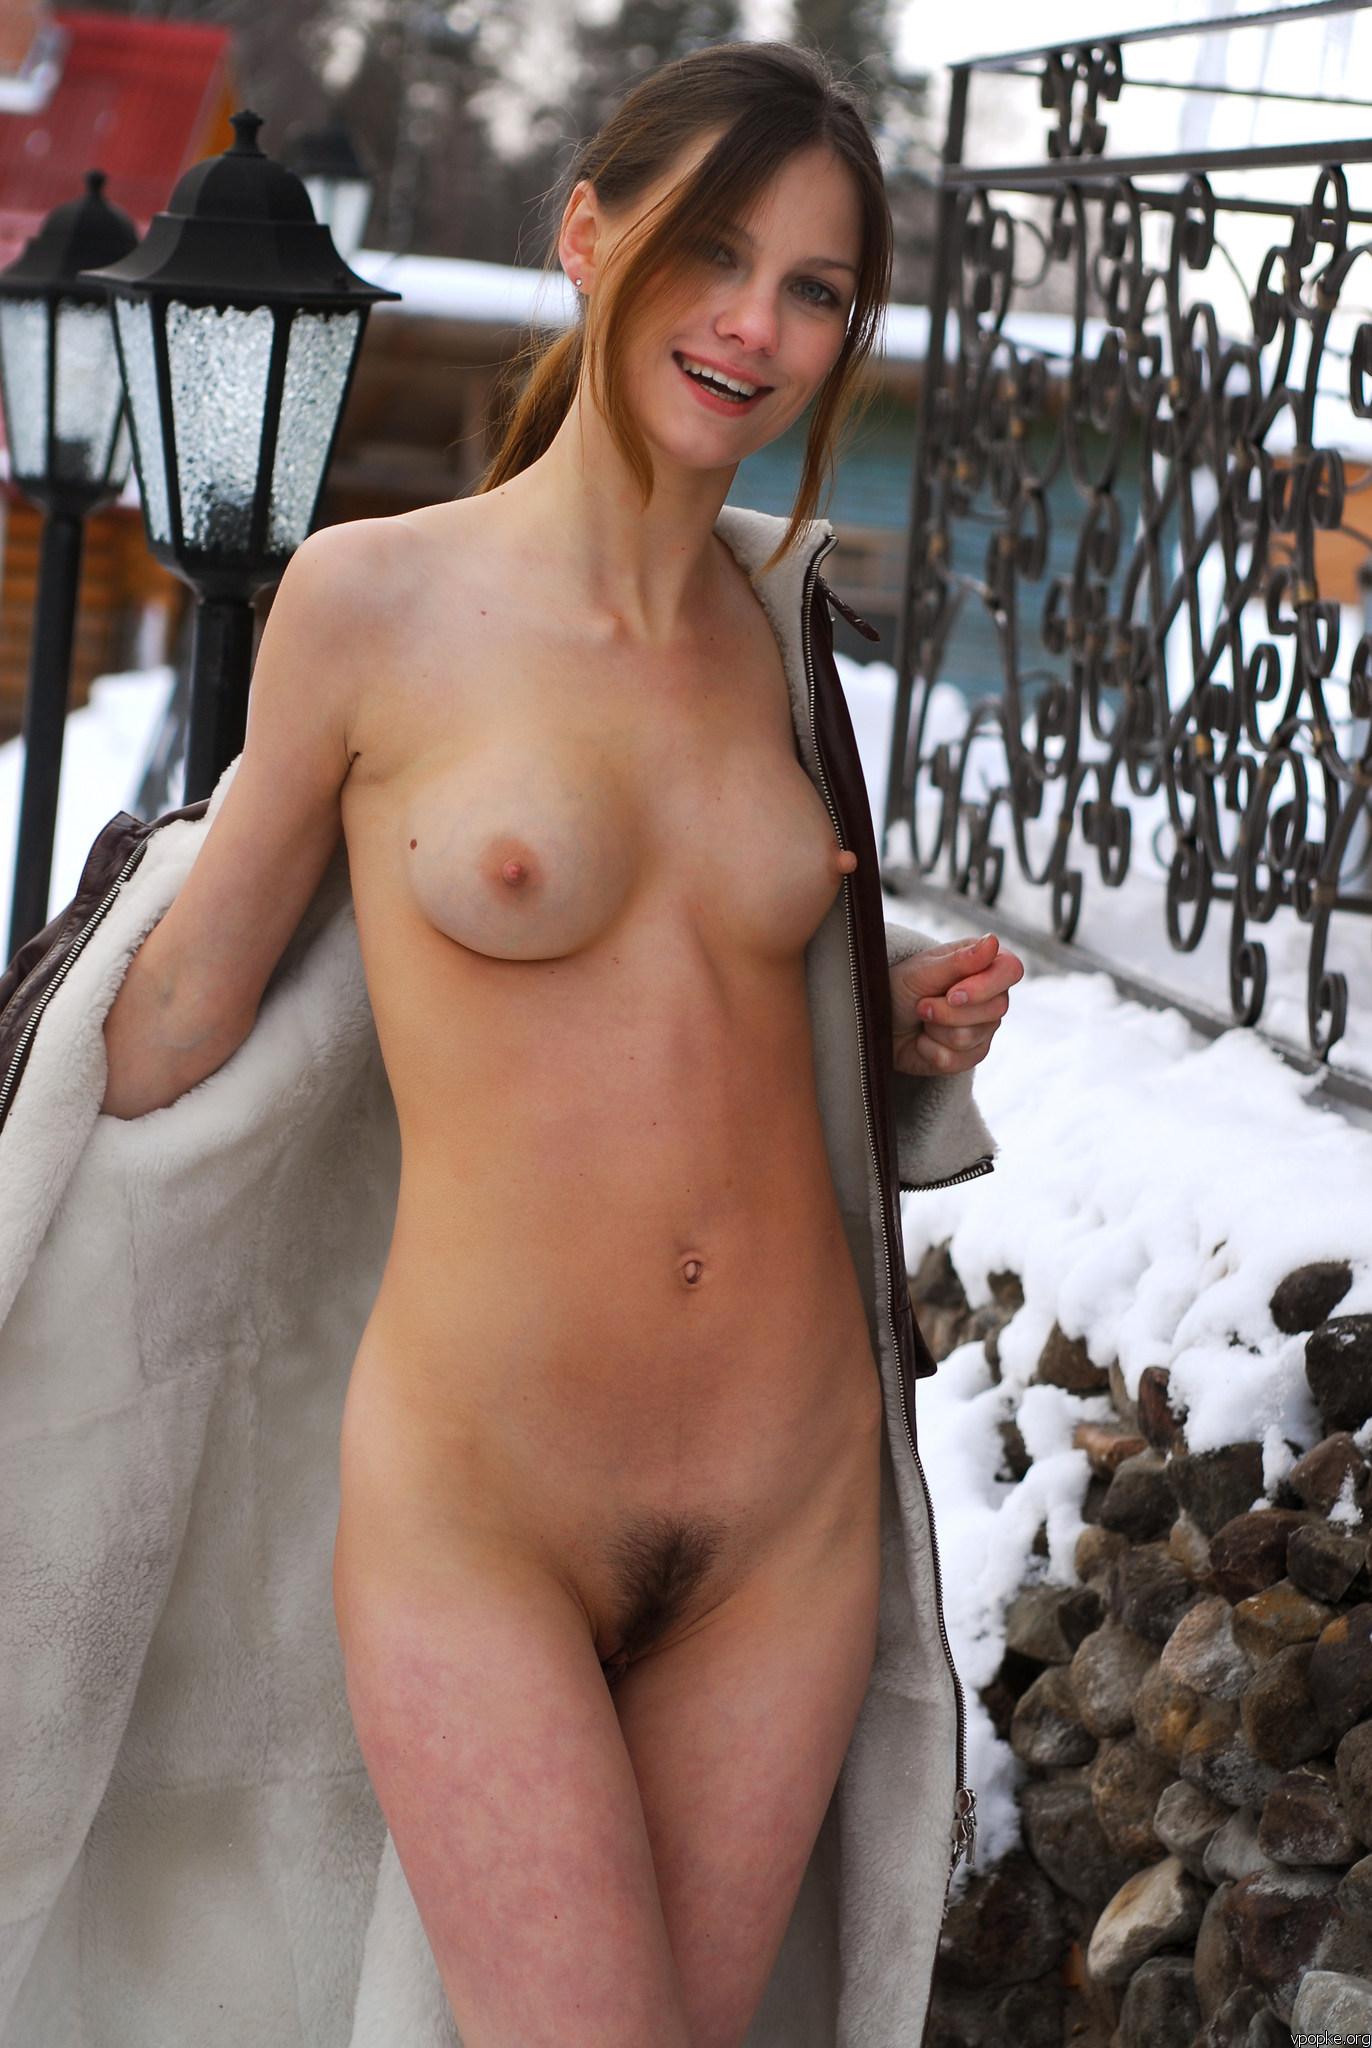 https://boobsmo.com/content/181/boobsmo_com_0000__56.jpg